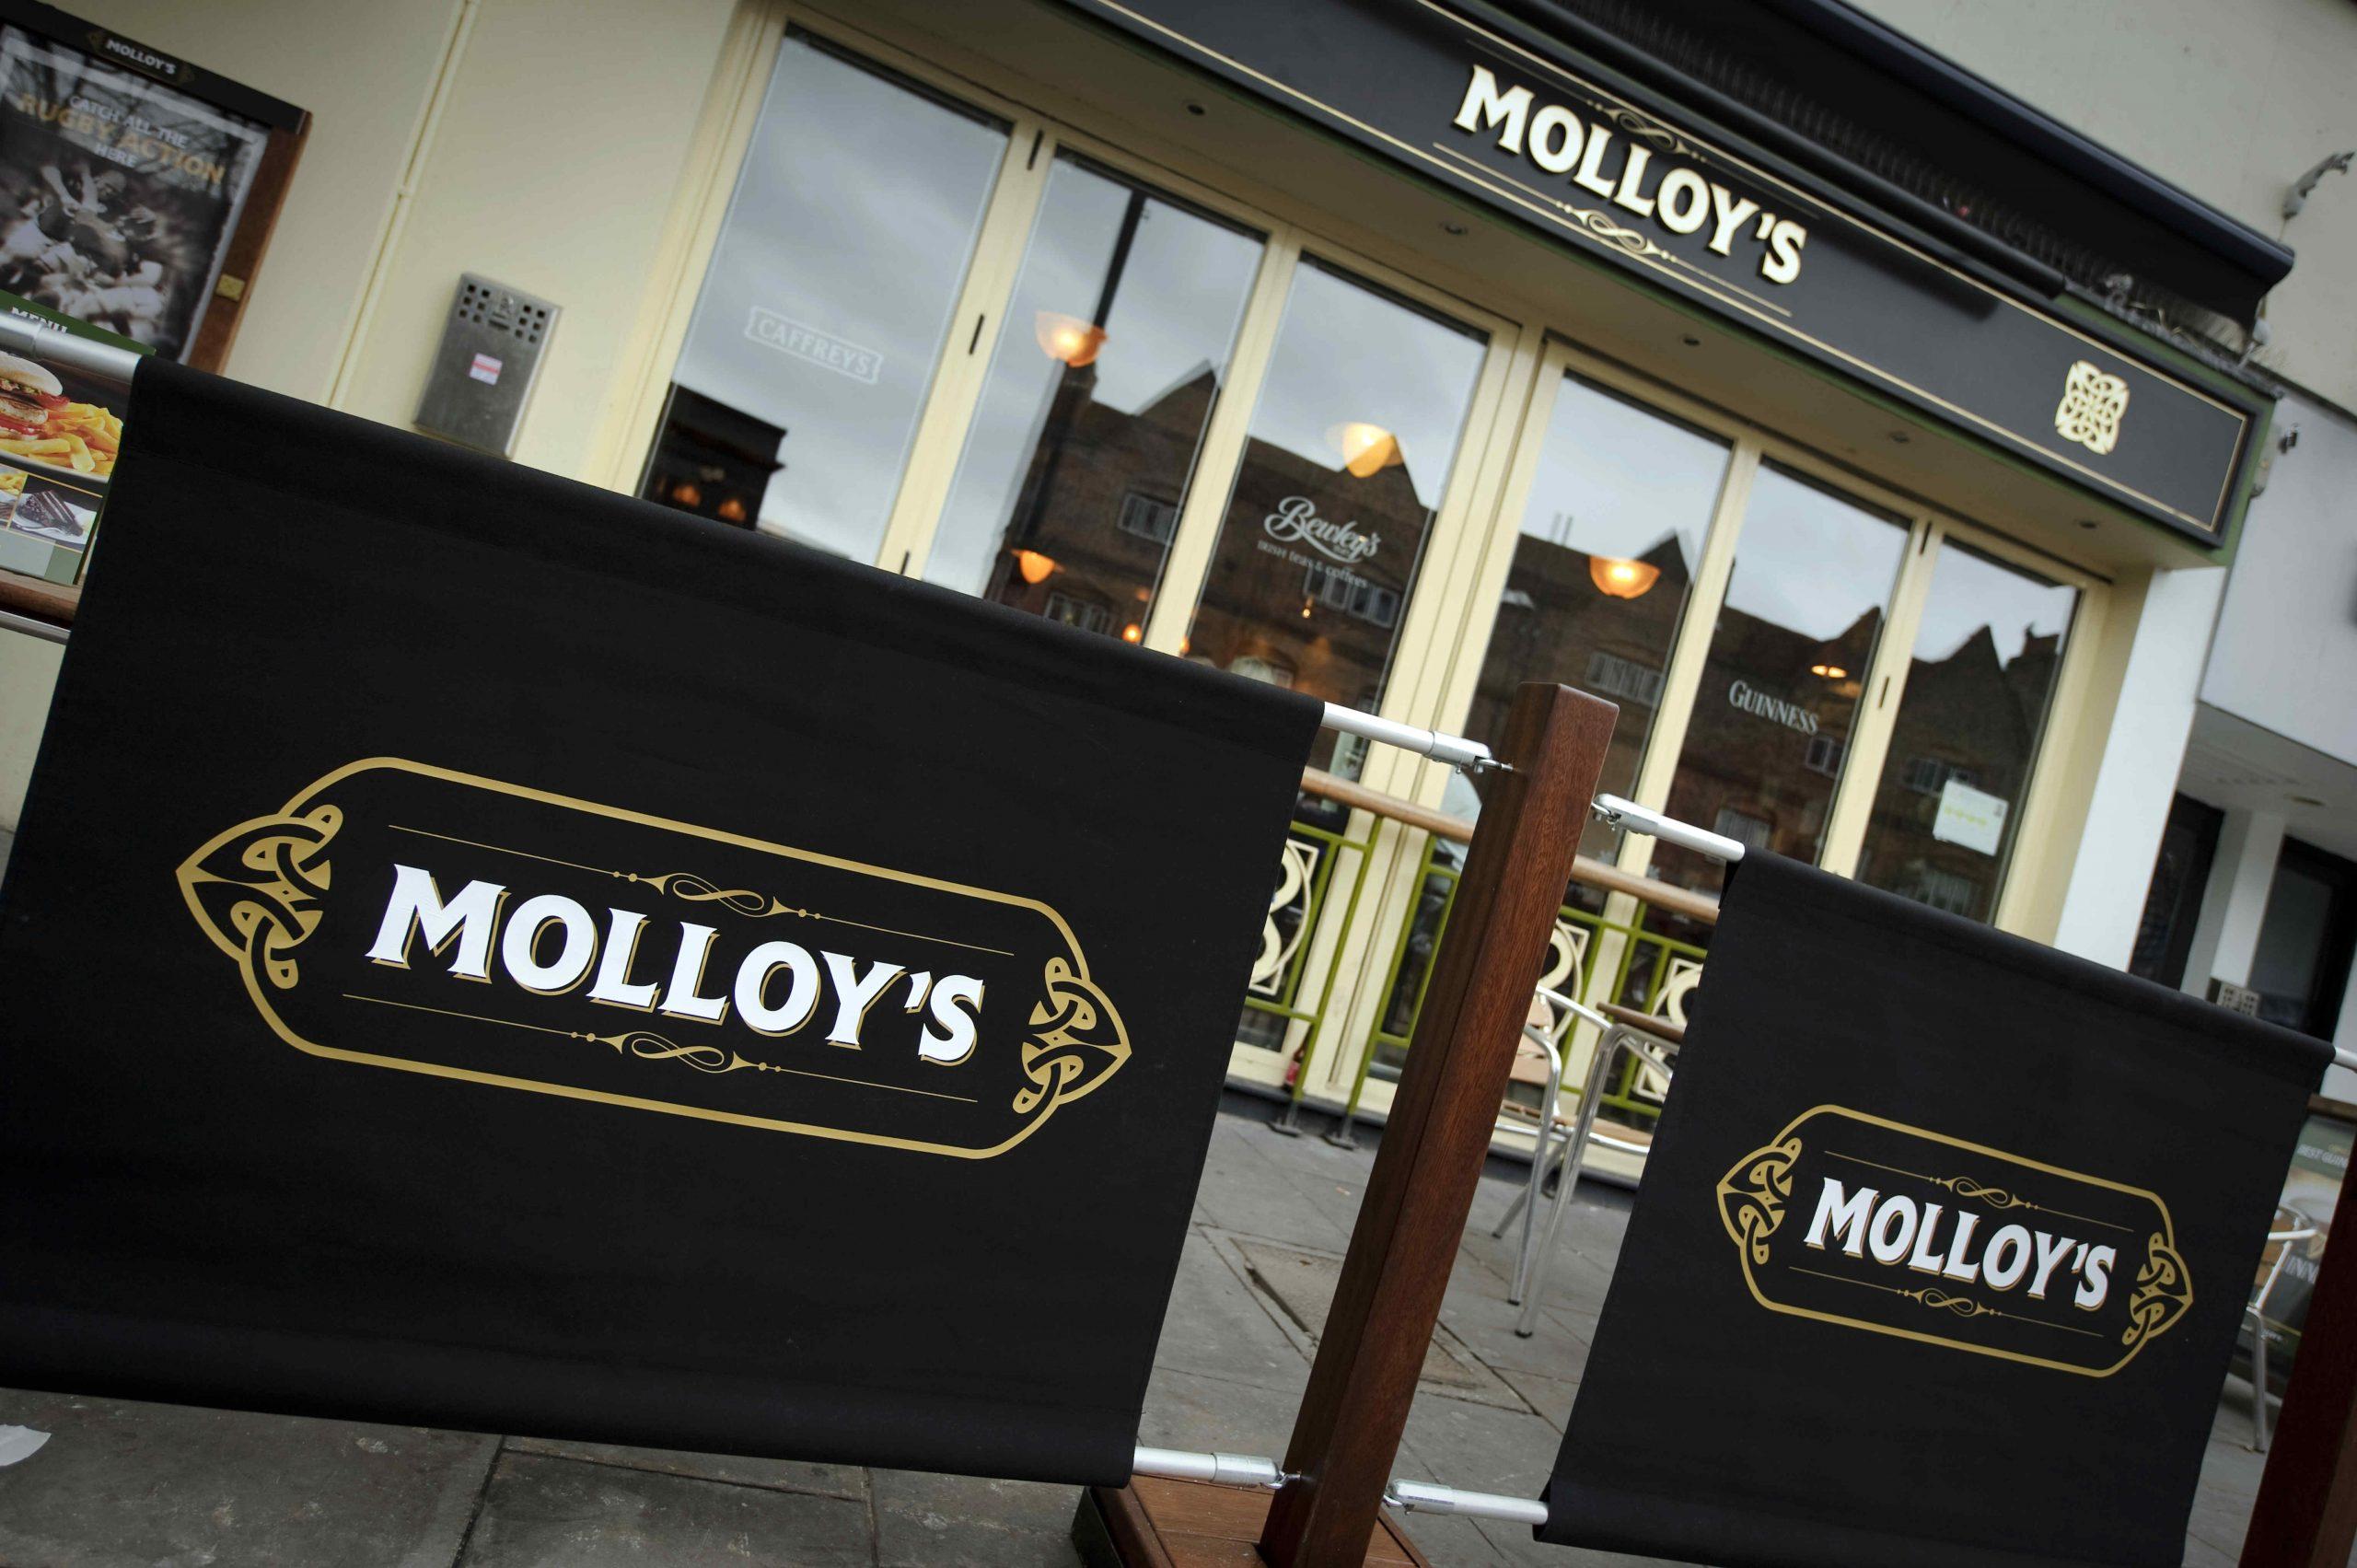 Raising a pint to launch Molloy's Irish pub chain